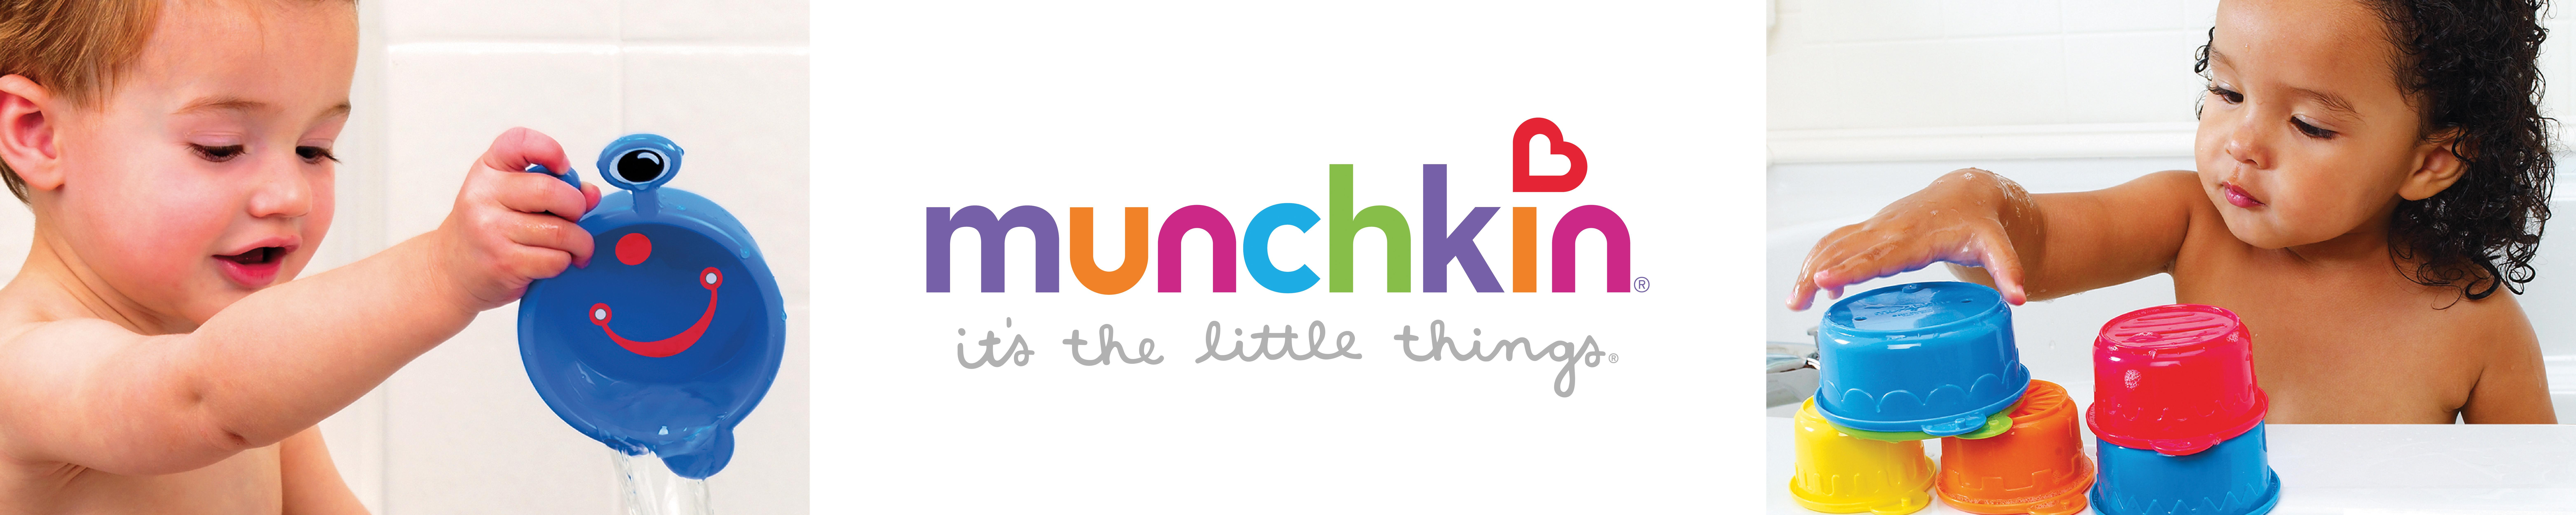 Munchkin Promo